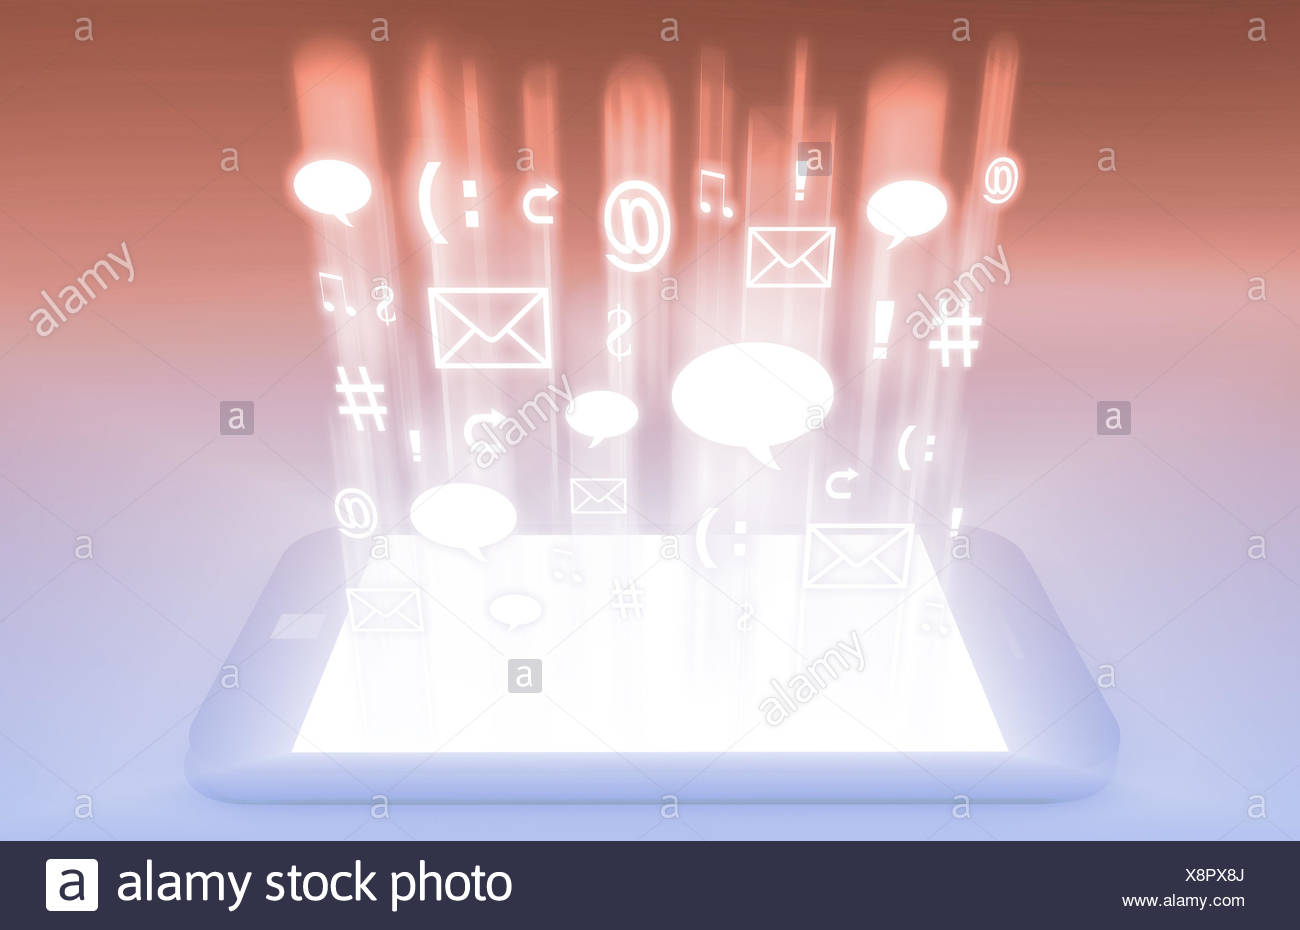 Emerging Mobile Market Media and Technologies Art Stock Photo